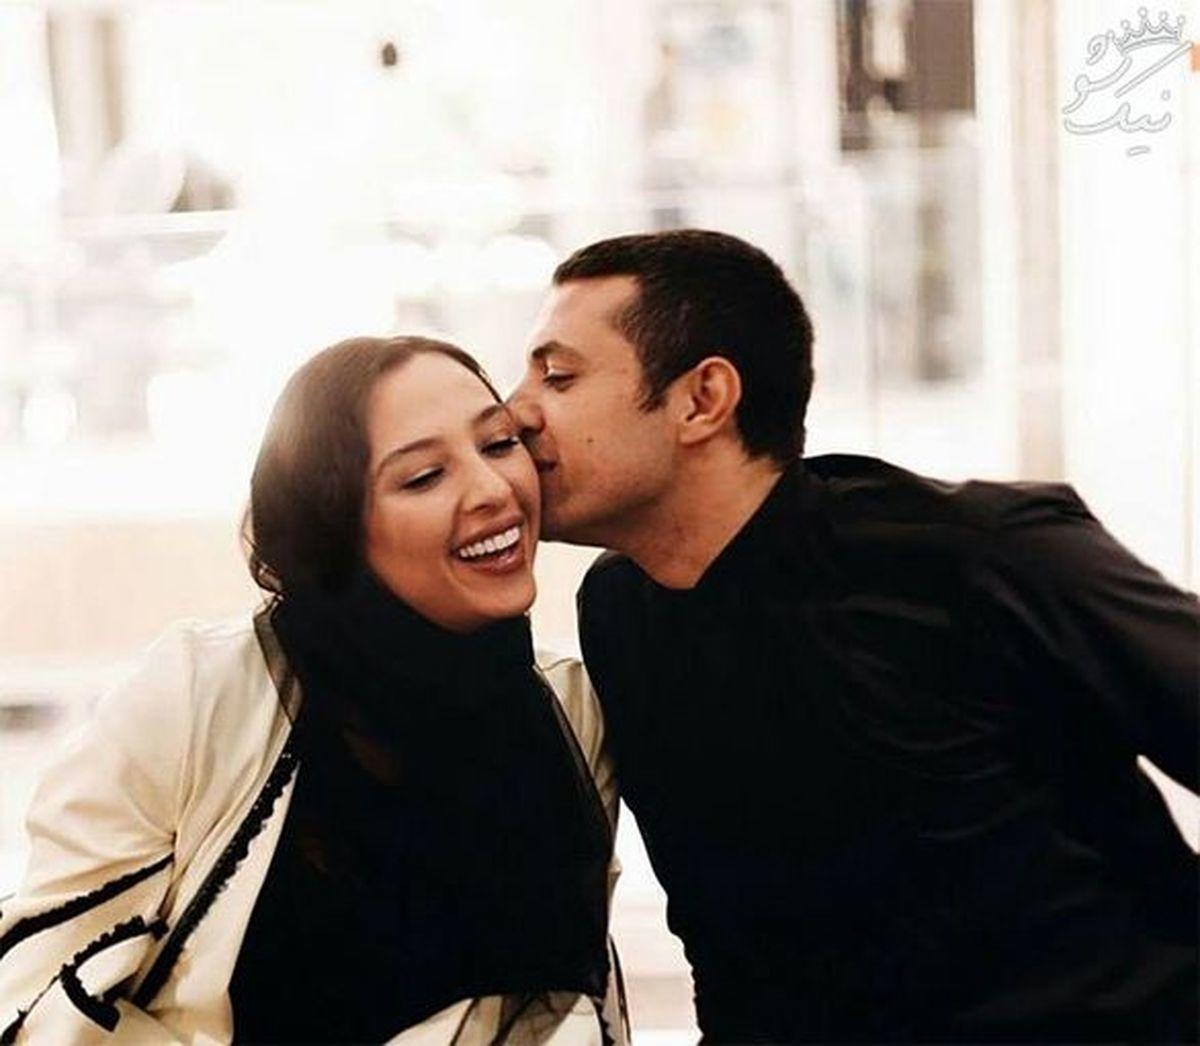 عکس عاشقانه اشکان خطیبی با عروس سابق علی پروین + عکس دونفره